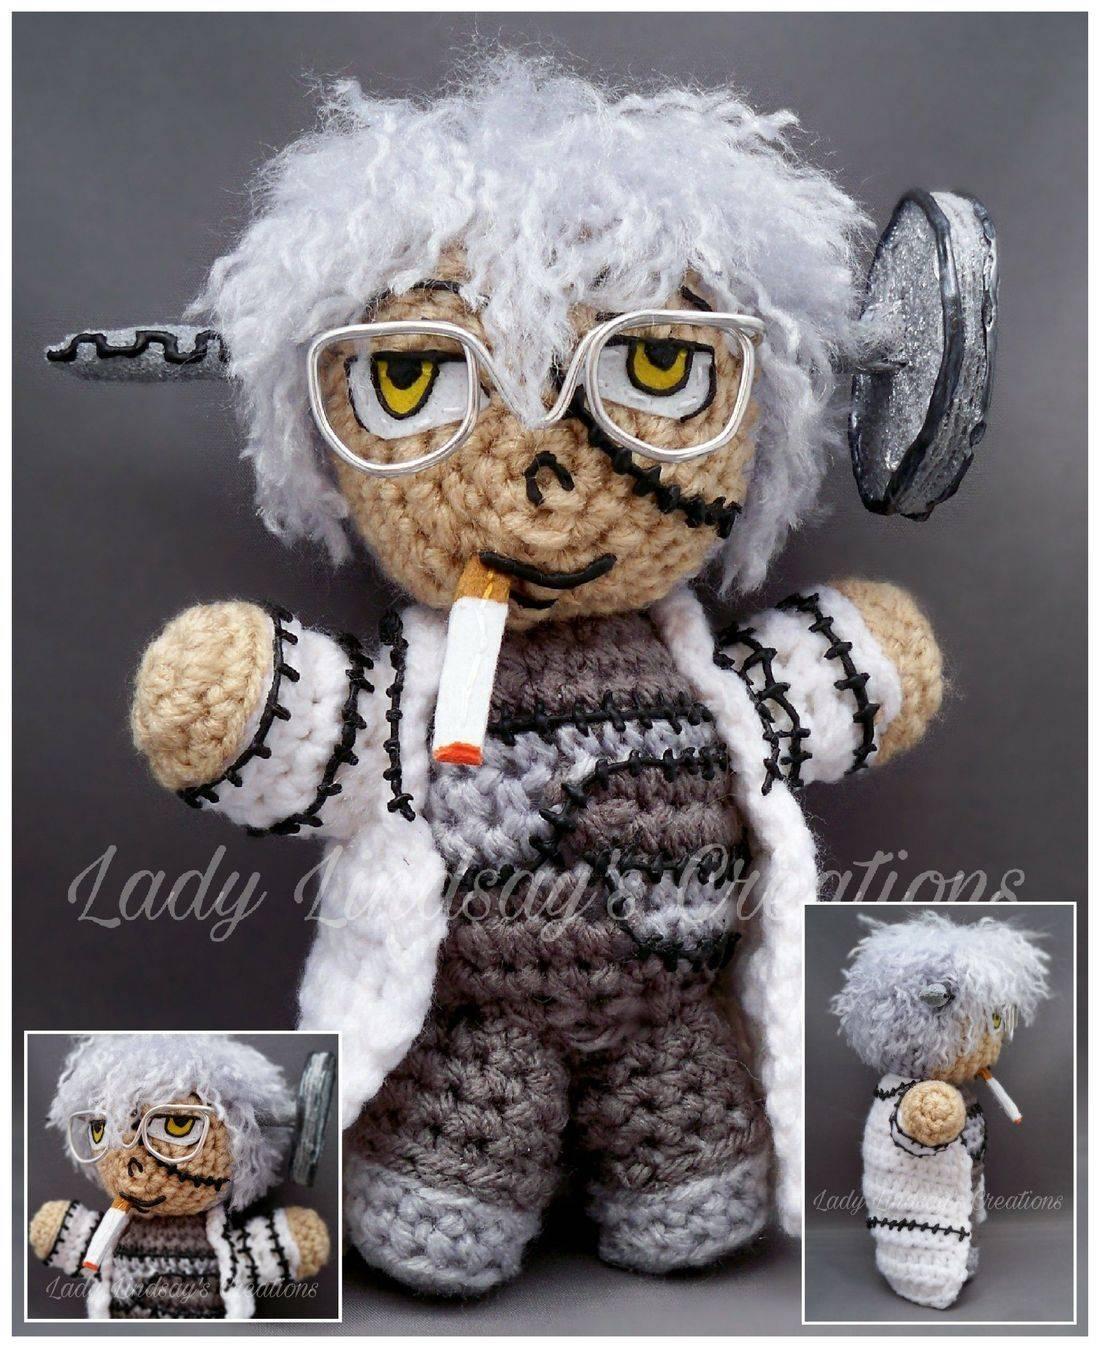 Professor Stein, Anime, Soul Eater, Otaku, Manga, Nerd, Geek, amigurumi, plush, crochet, handmade,  etsy, shop small